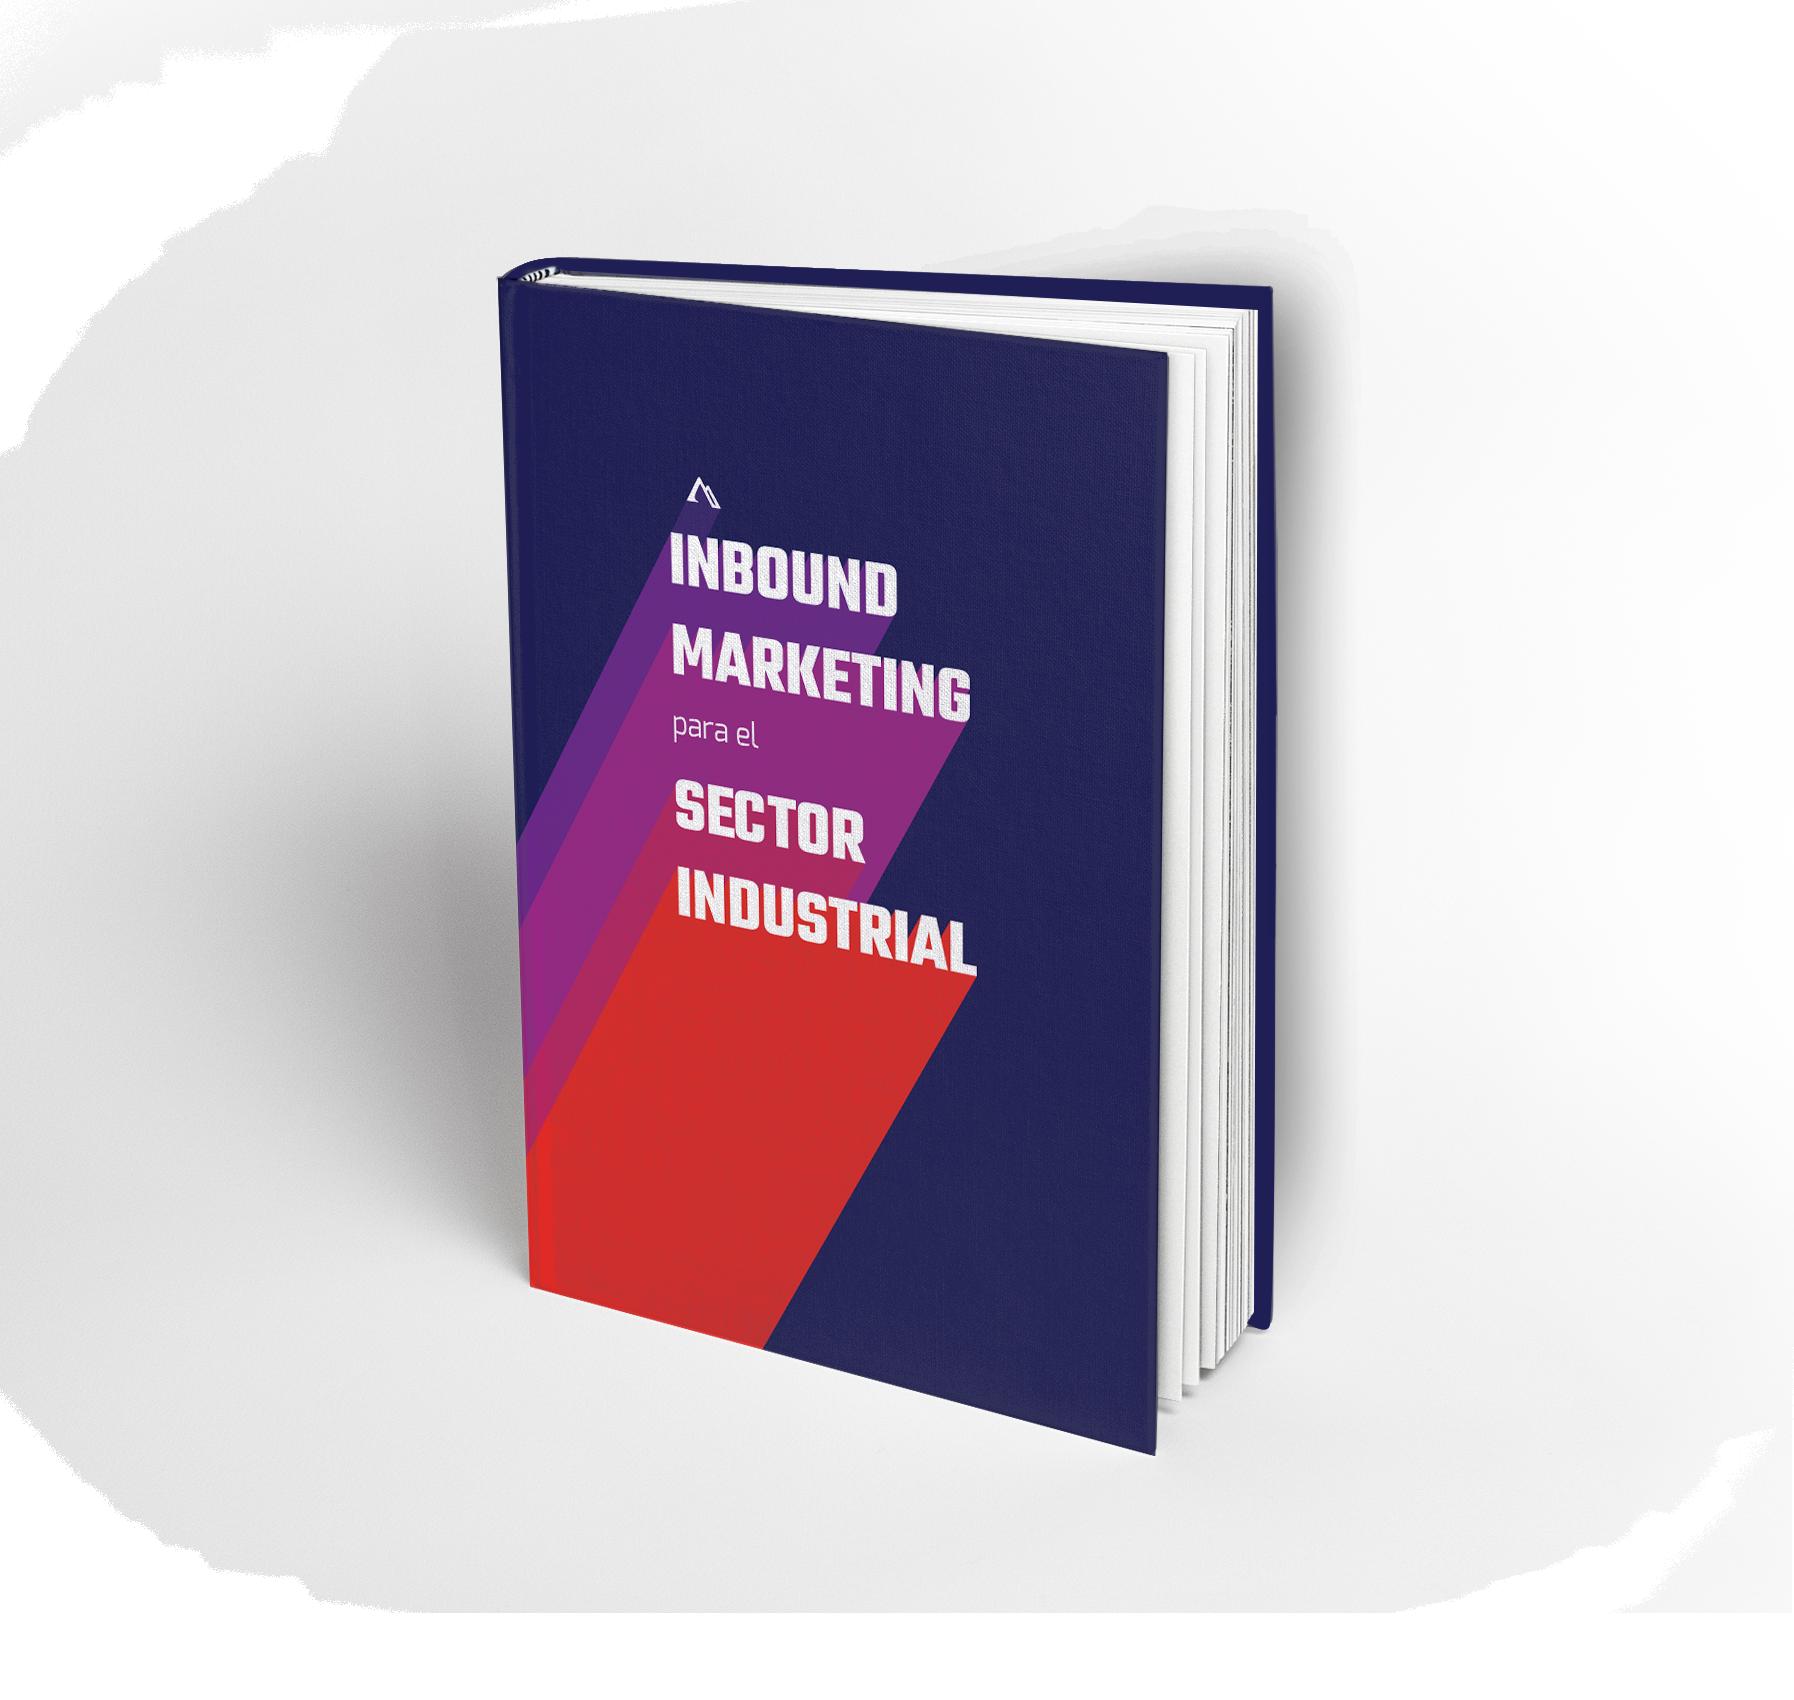 inbound-marketing-sector-industrial.png